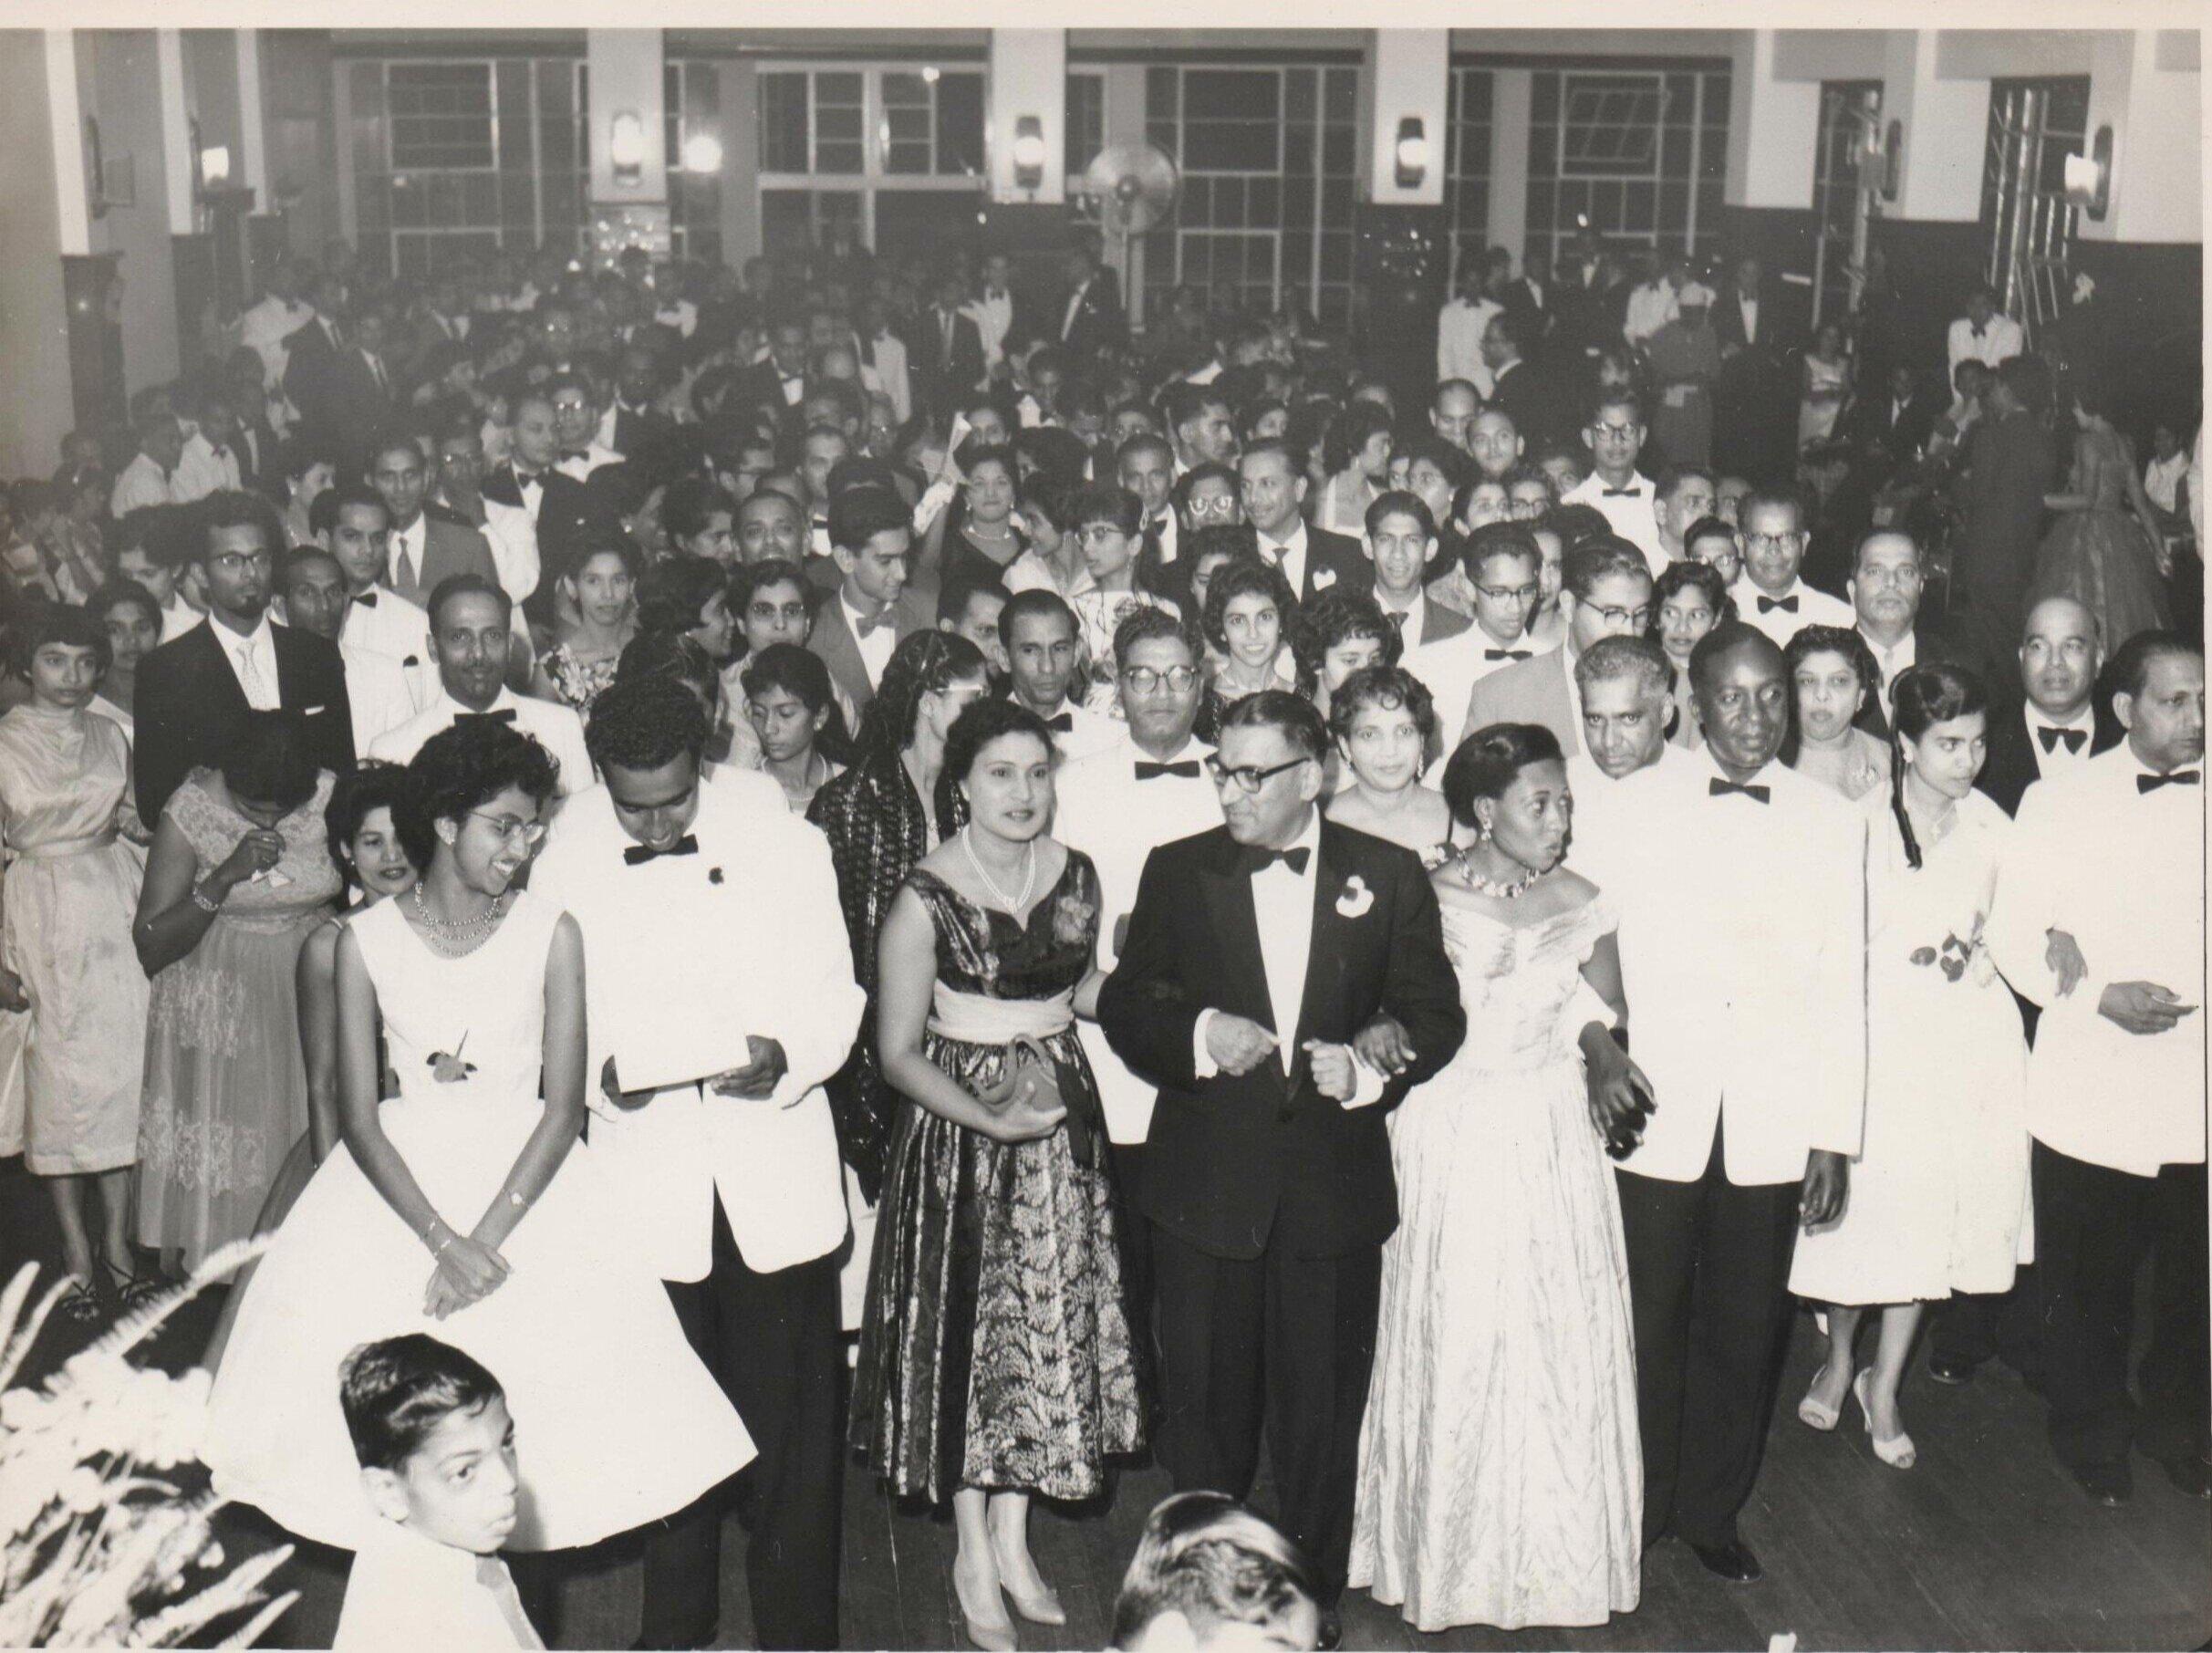 50th anniversary, Goan Entebbe Inst., June 1960